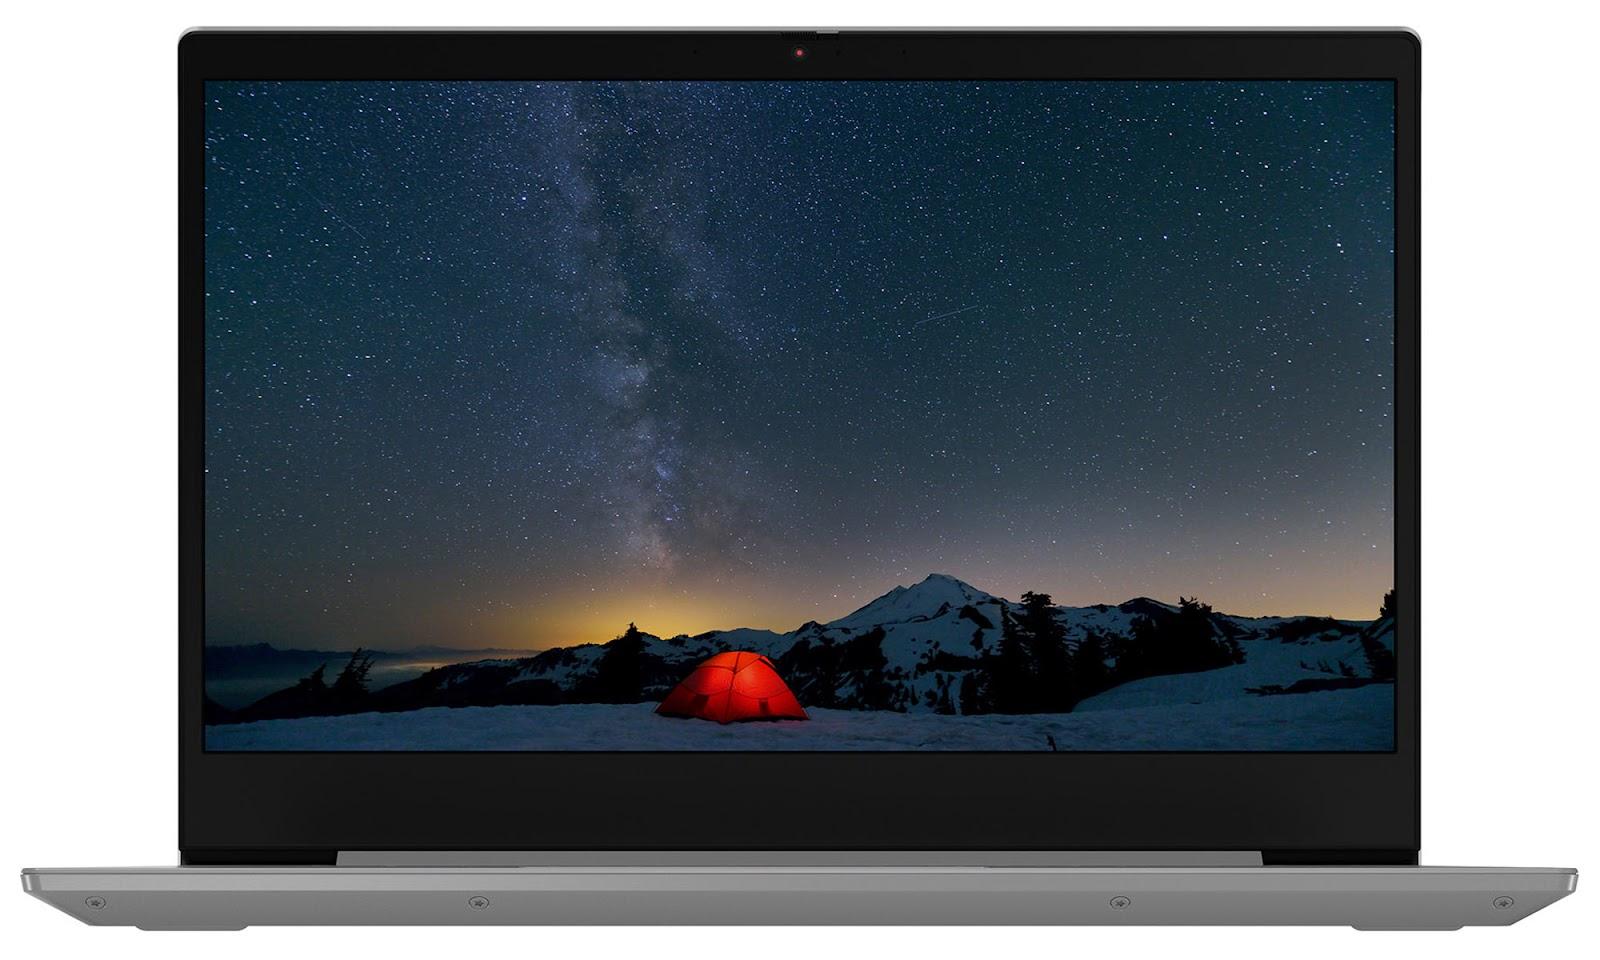 Фото 1. Ноутбук Lenovo ThinkBook 14 IIL (20SL00JURU)